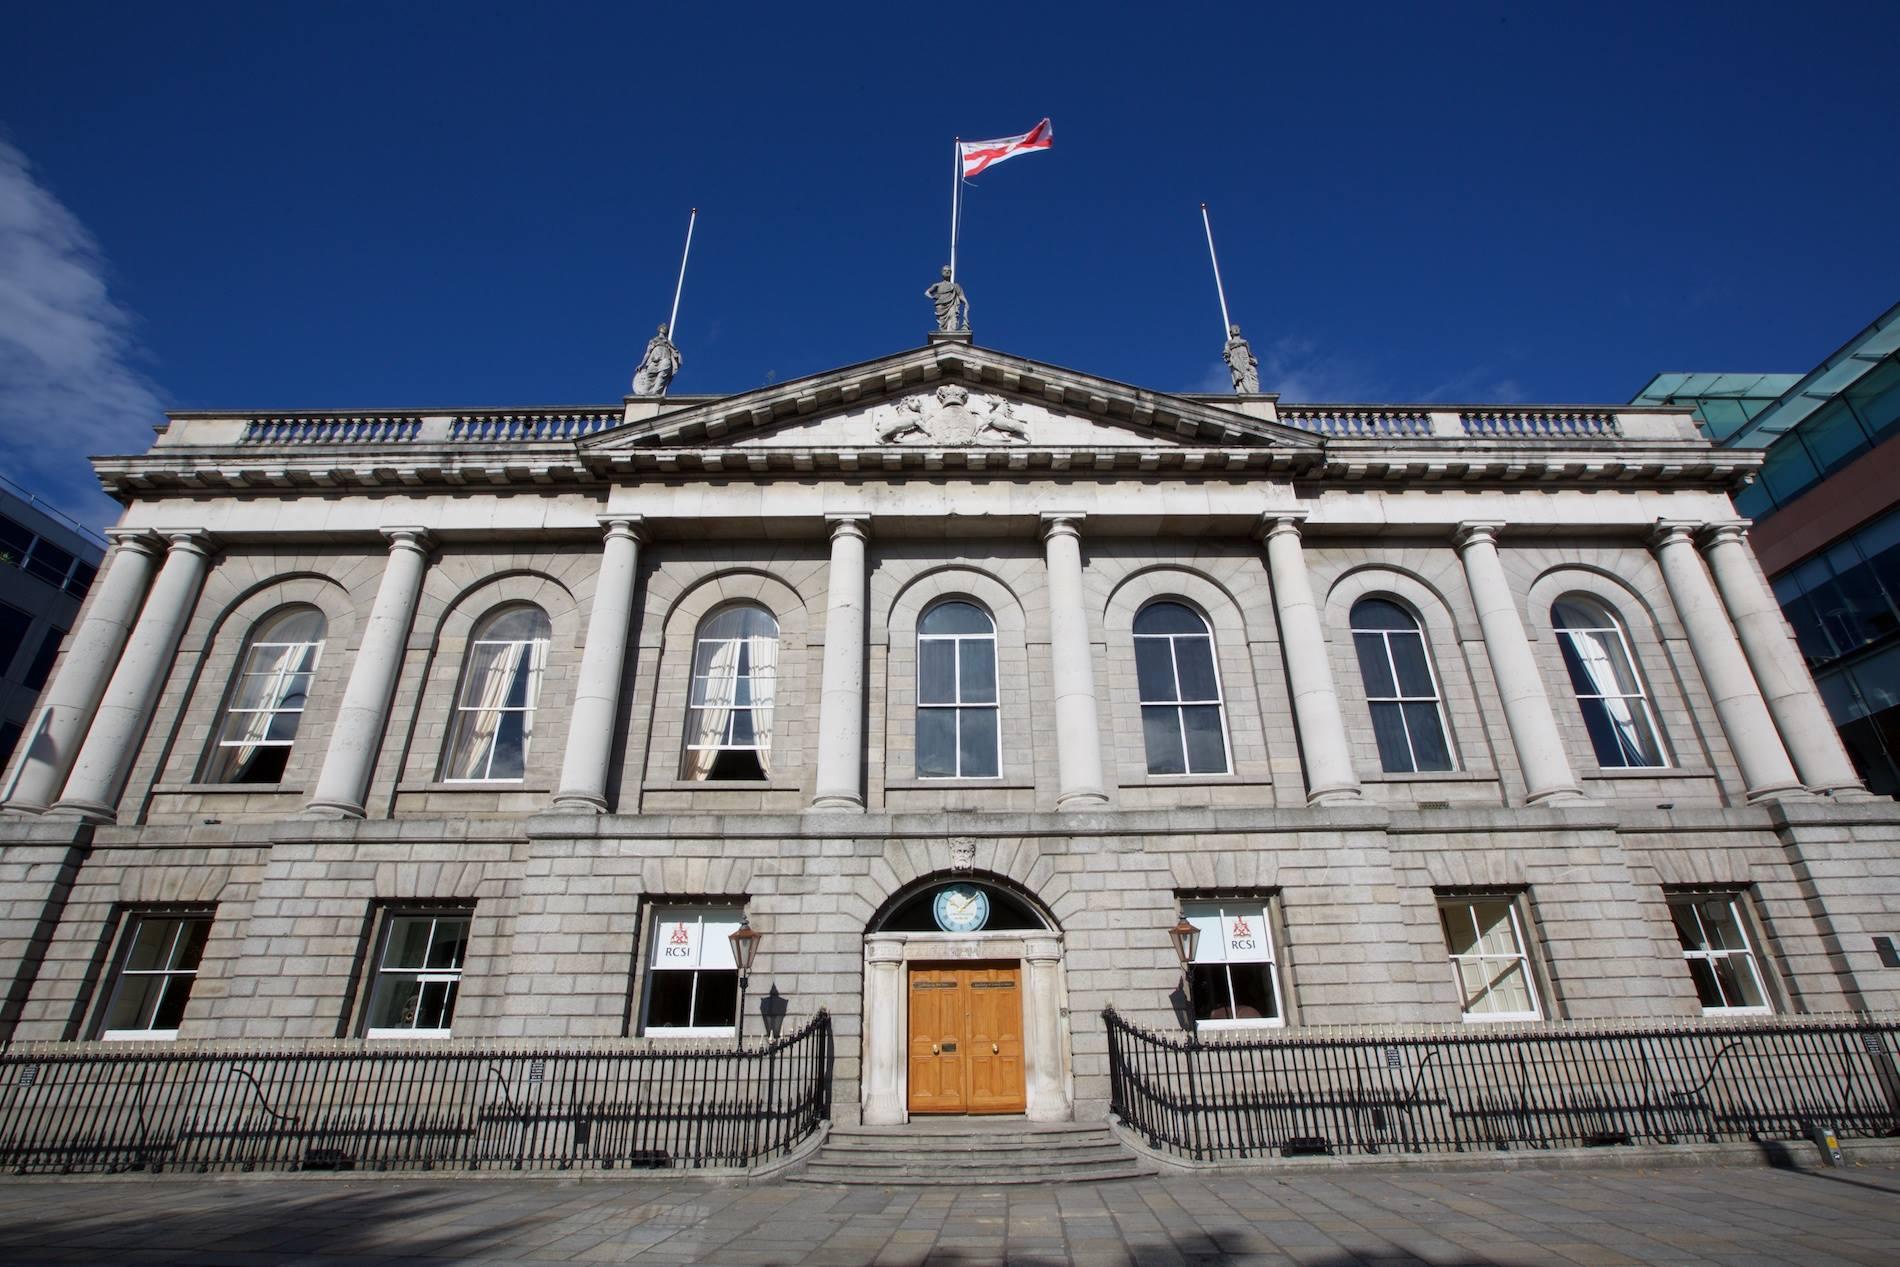 Royal College of Surgeons in Ireland - RCSI Campus